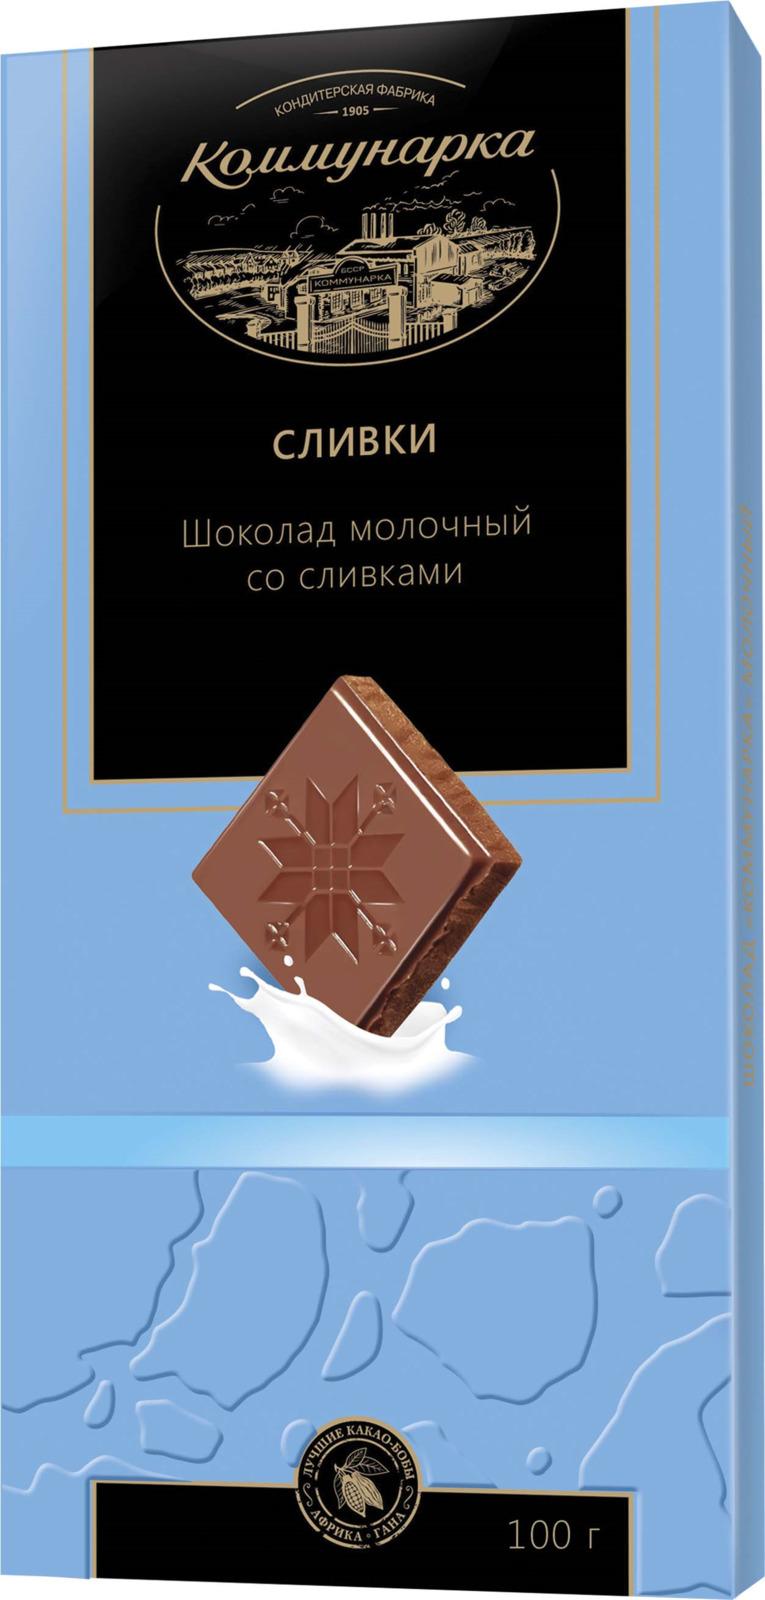 Коммунарка шоколад молочный, со сливками, 100 г цена 2017